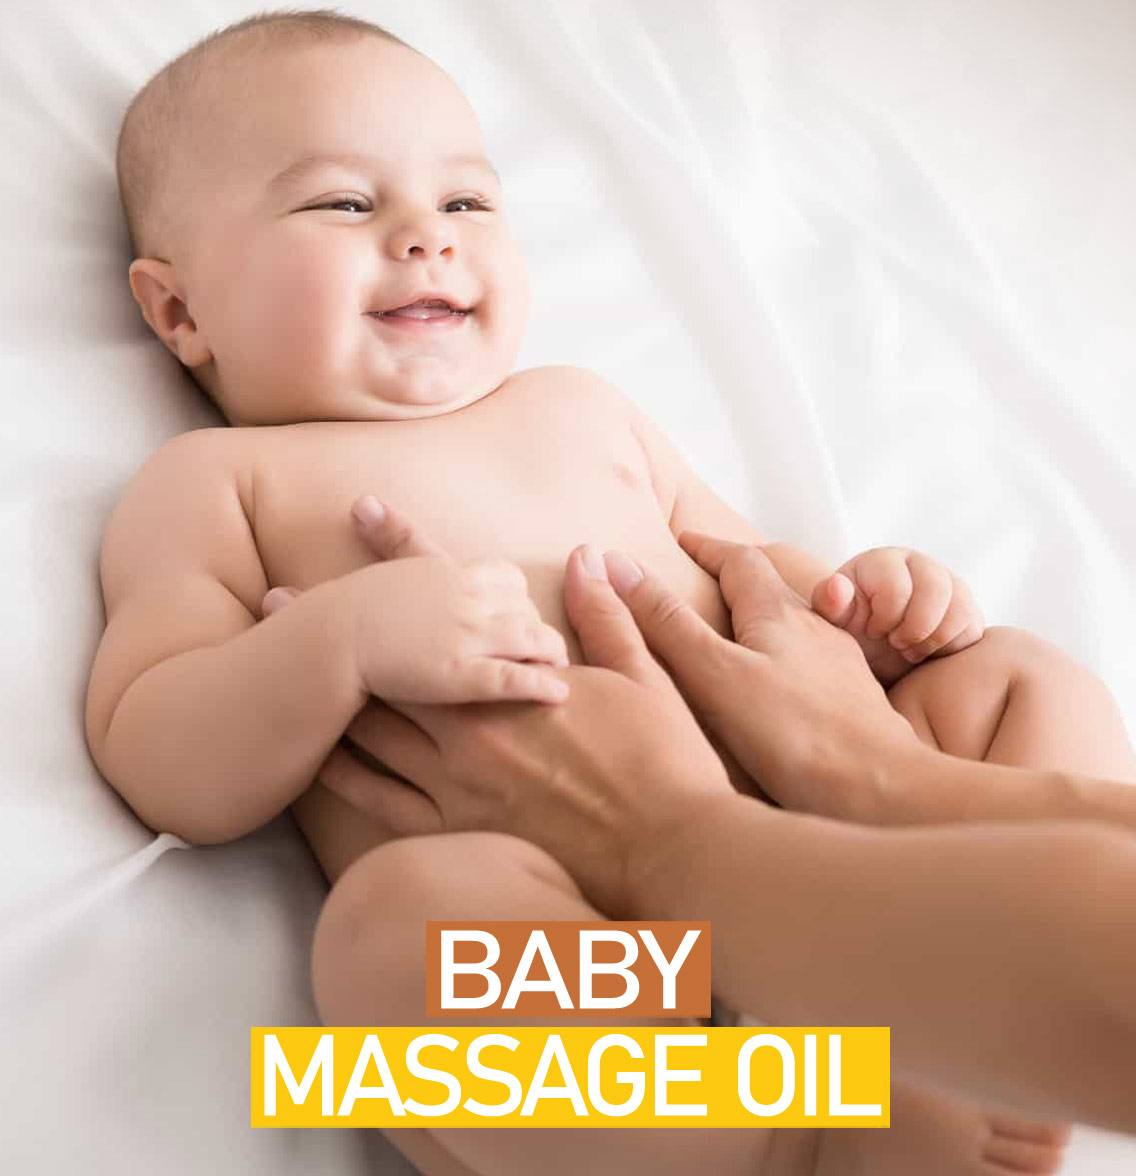 Baby Massage Oil for Ultra-Soft Skin